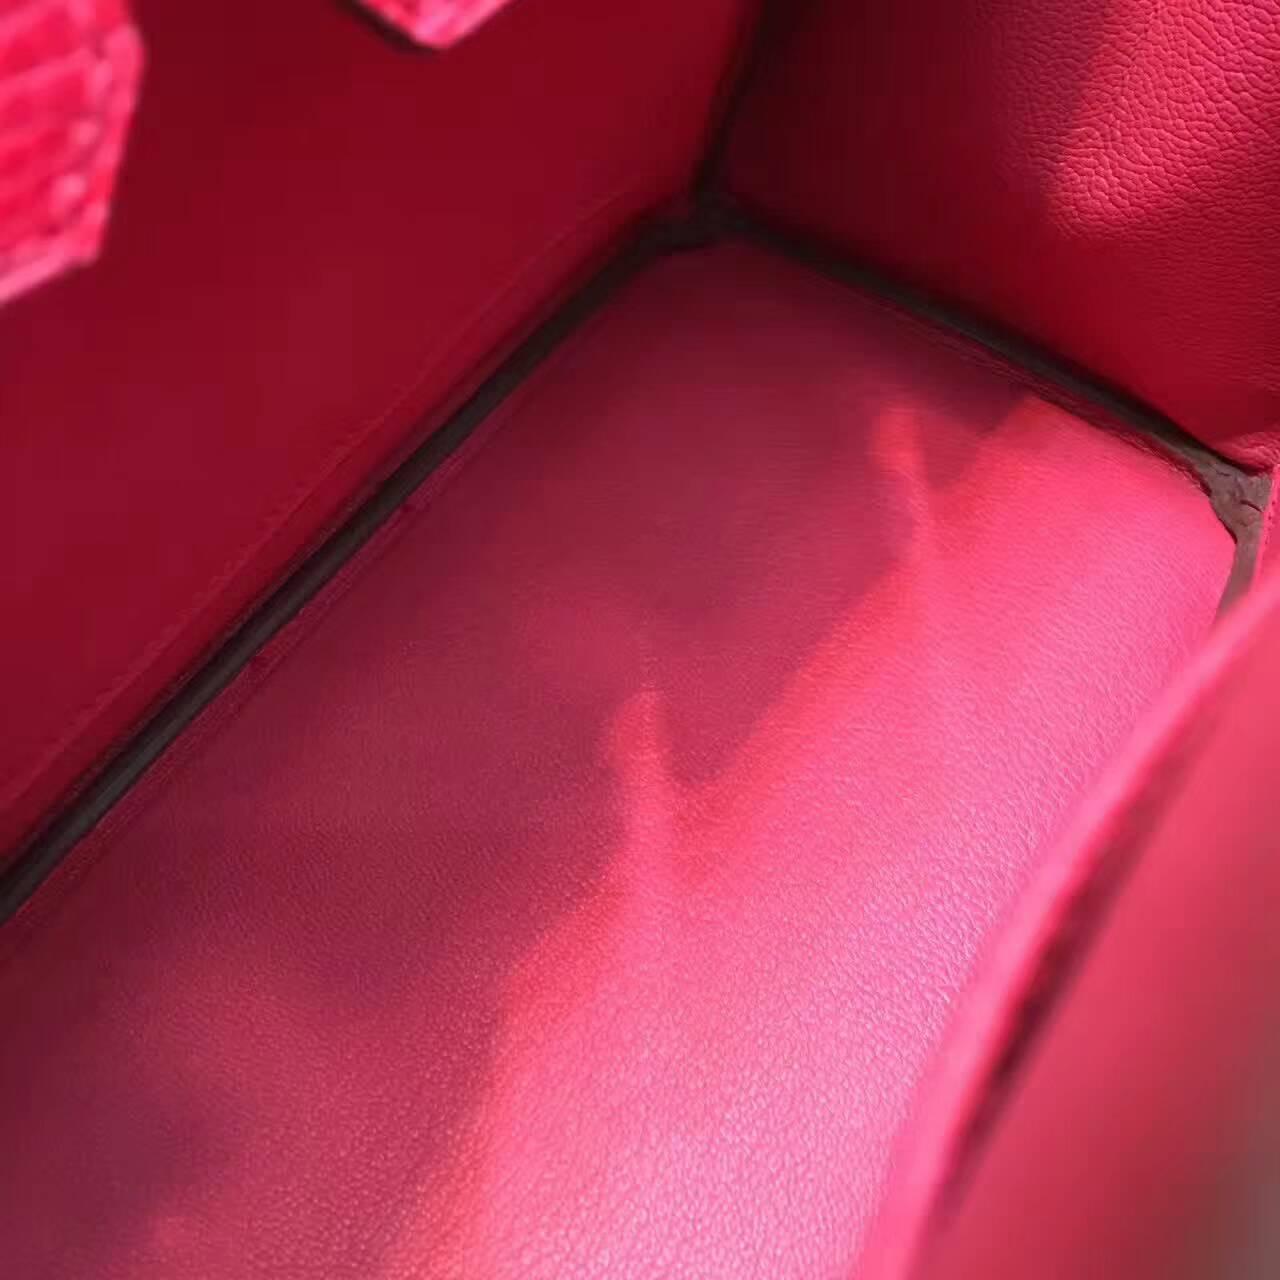 Birkin铂金包 Hermes包包 25cm Lizard 东南亚原产蜥蜴皮 8W Rose Azalee 唇膏粉 金扣